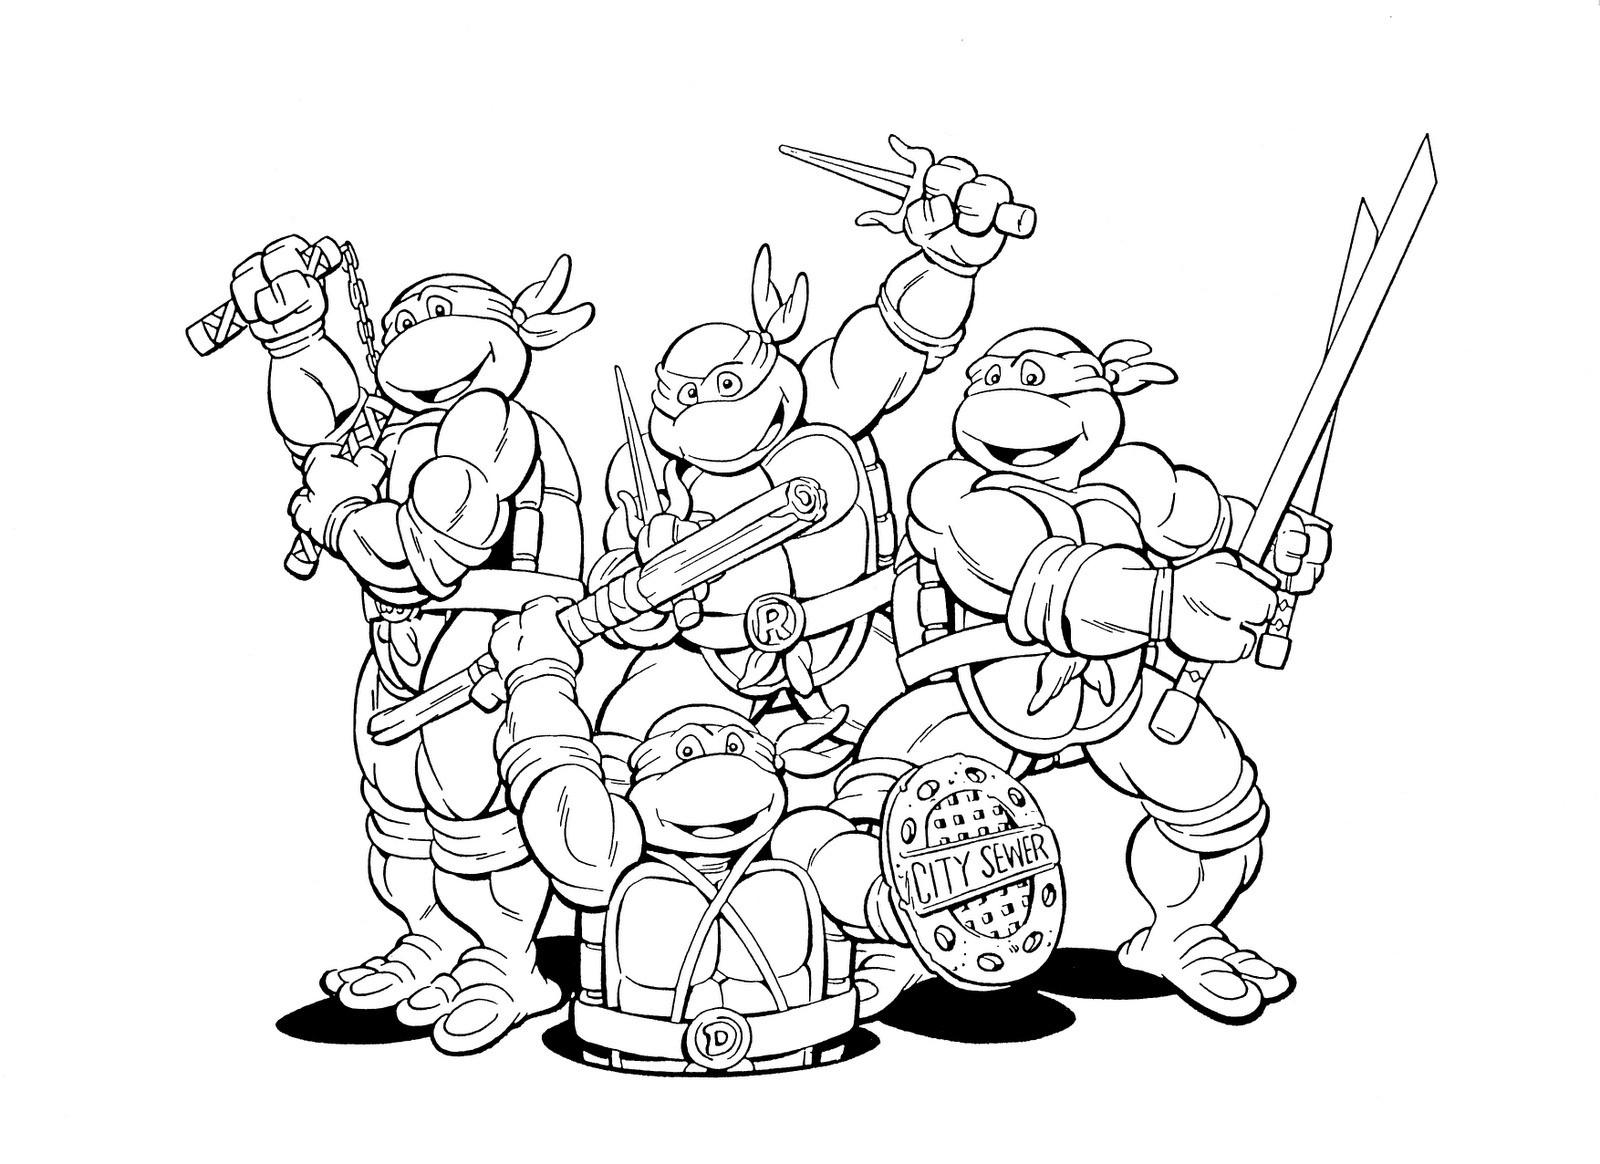 Ninja Turtle Ausmalbilder Einzigartig Teenage Mutant Ninja Turtles Faces Coloring Pages Unique 44 Neu Fotografieren